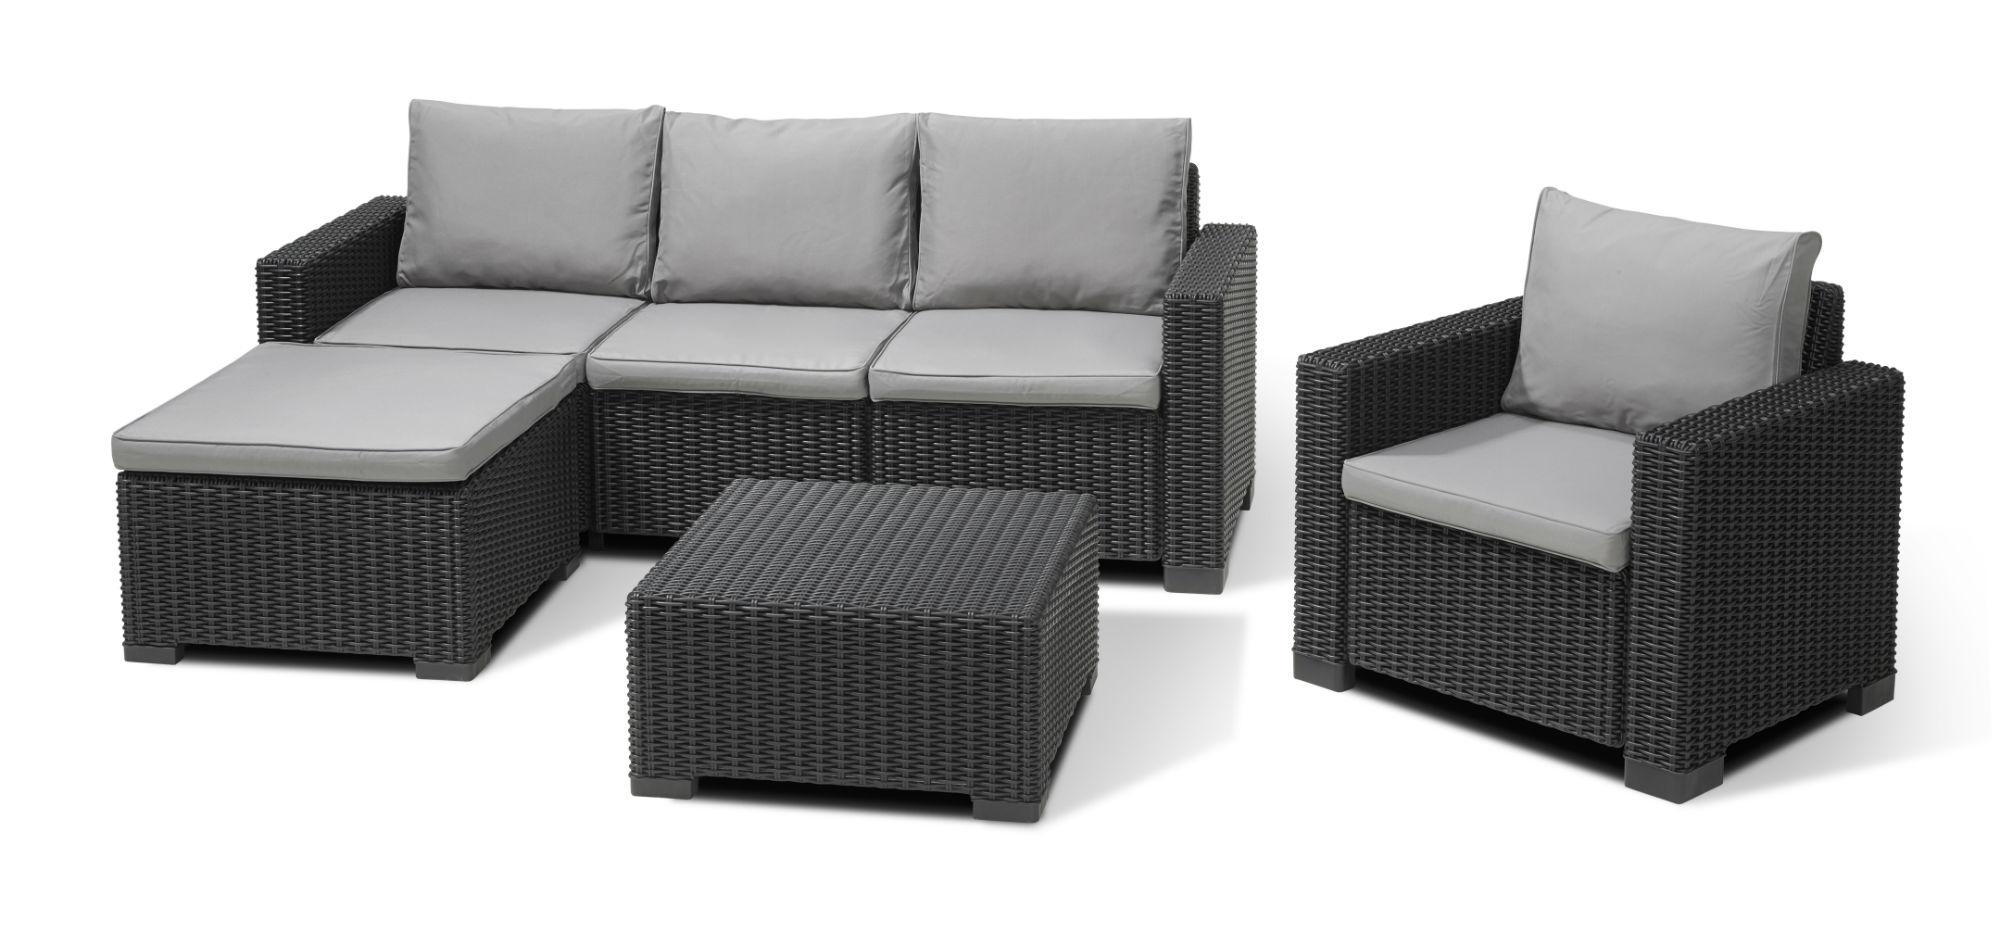 Allibert Moorea Lounge Set Graphit - Allibert destiné Salon De Jardin Allibert California